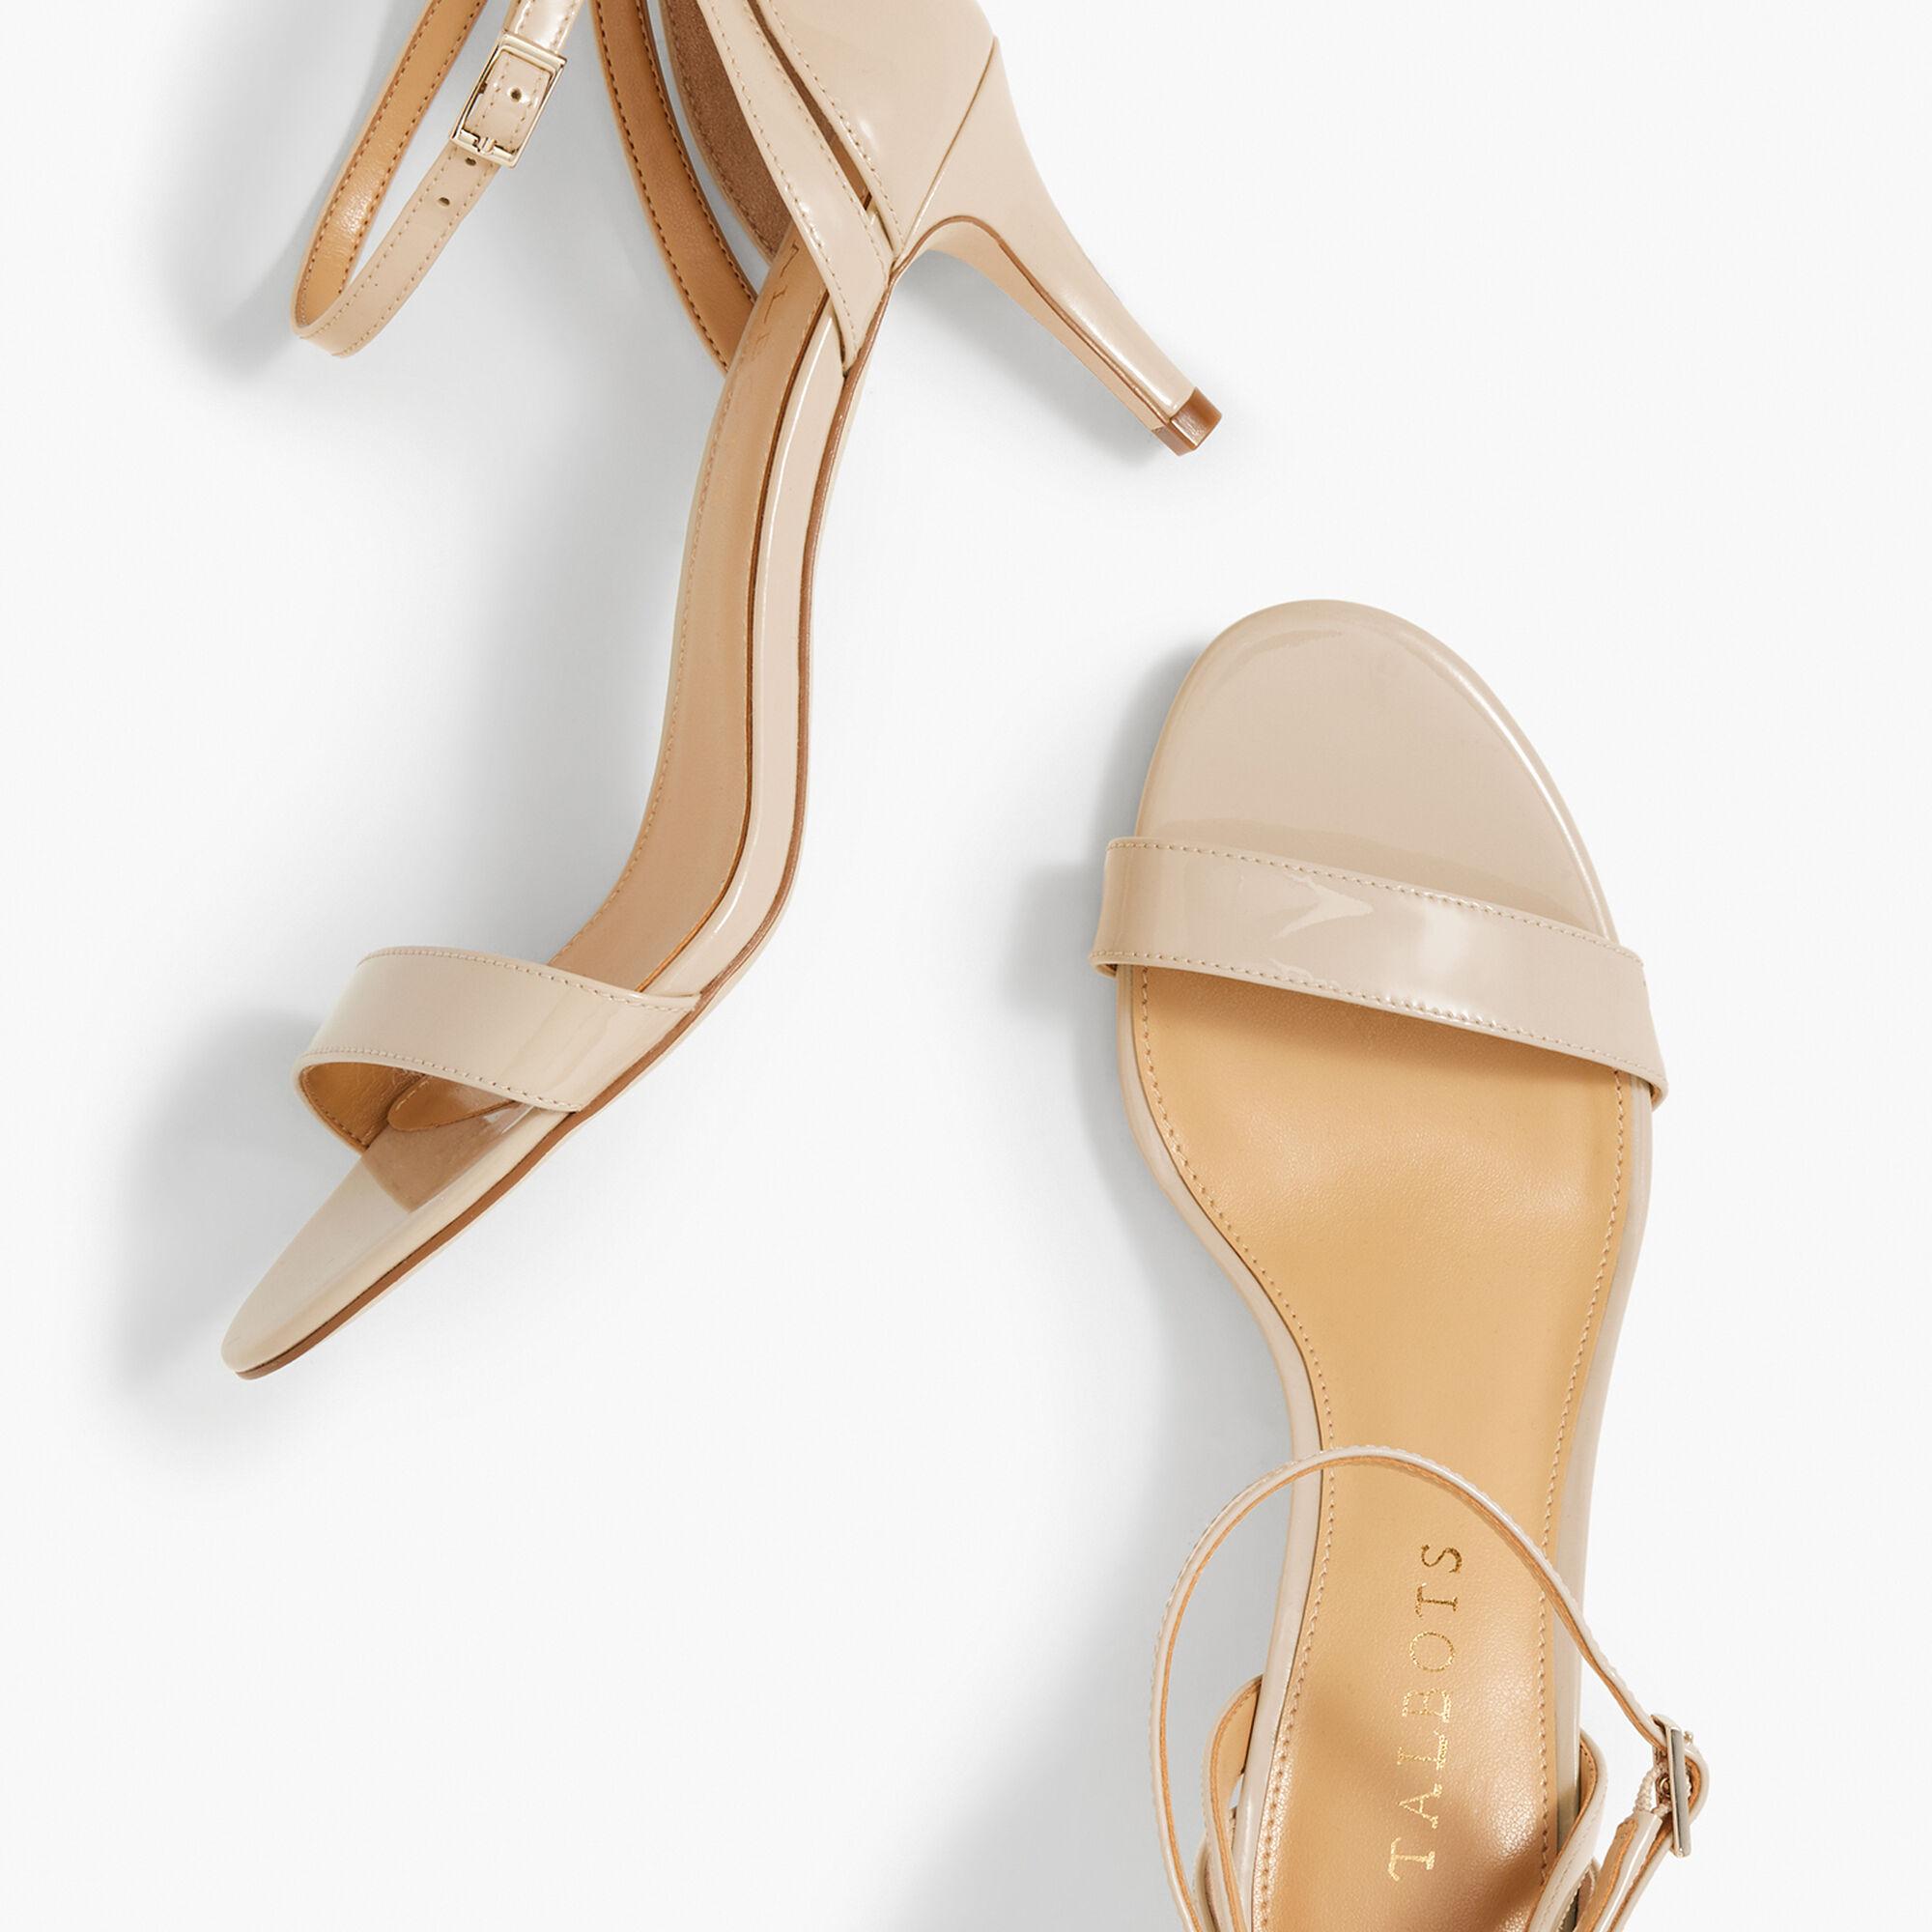 eea5d7b3a28 Images. Rosalie Ankle-Strap Sandals - Patent Leather